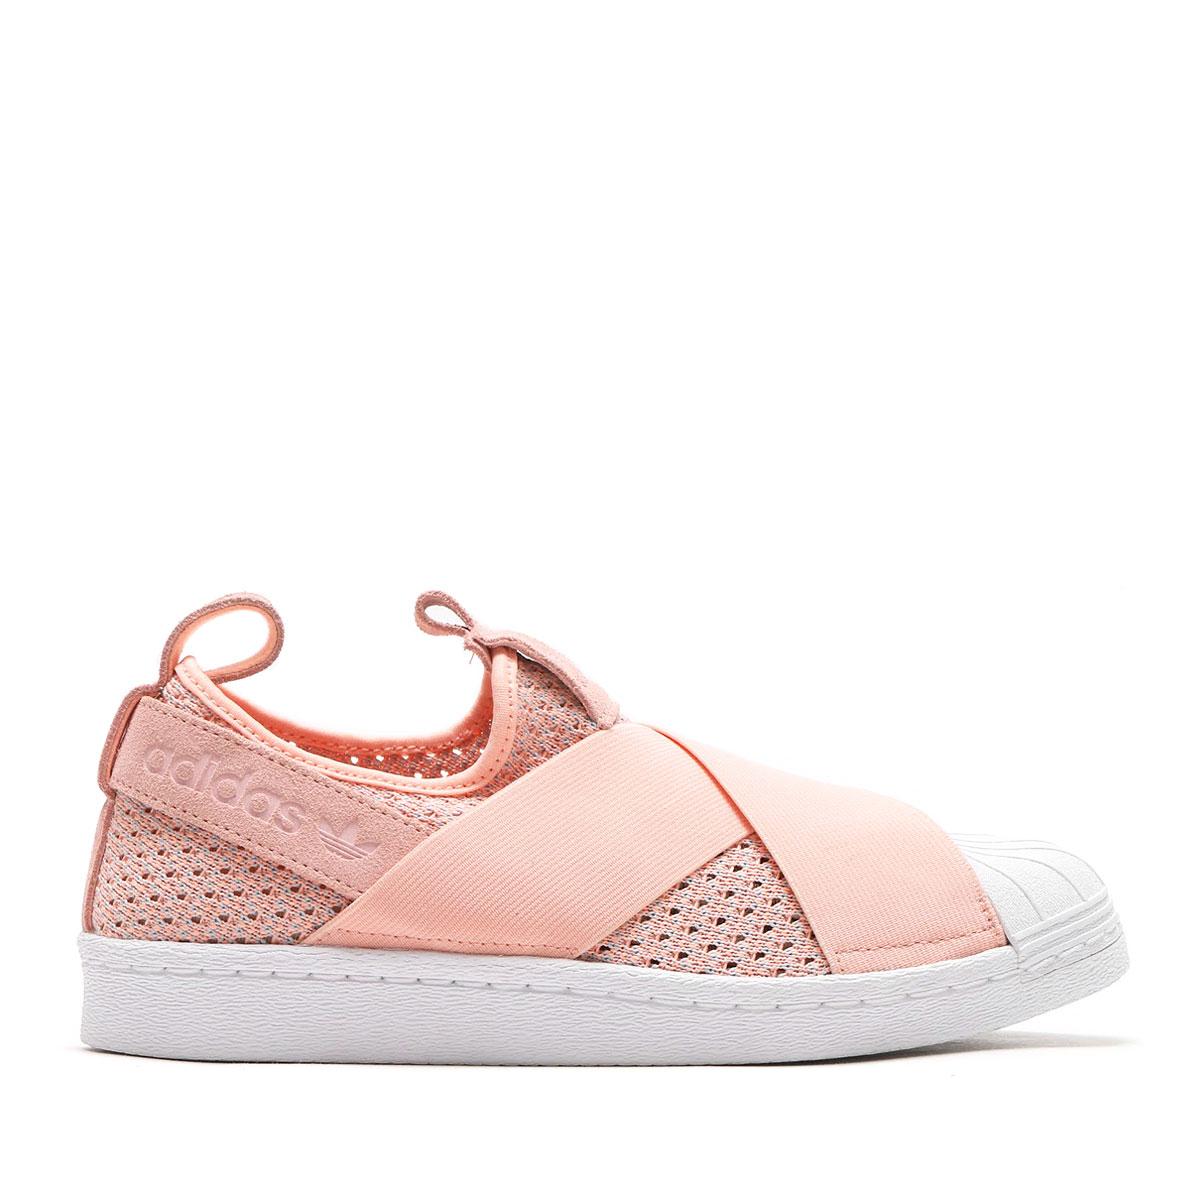 the latest 86efc 1e511 adidas Originals SUPERSTAR SlipOn W (Adidas superstar slip-on W) (Haze  Coral S17 Haze Coral S17 Off White)